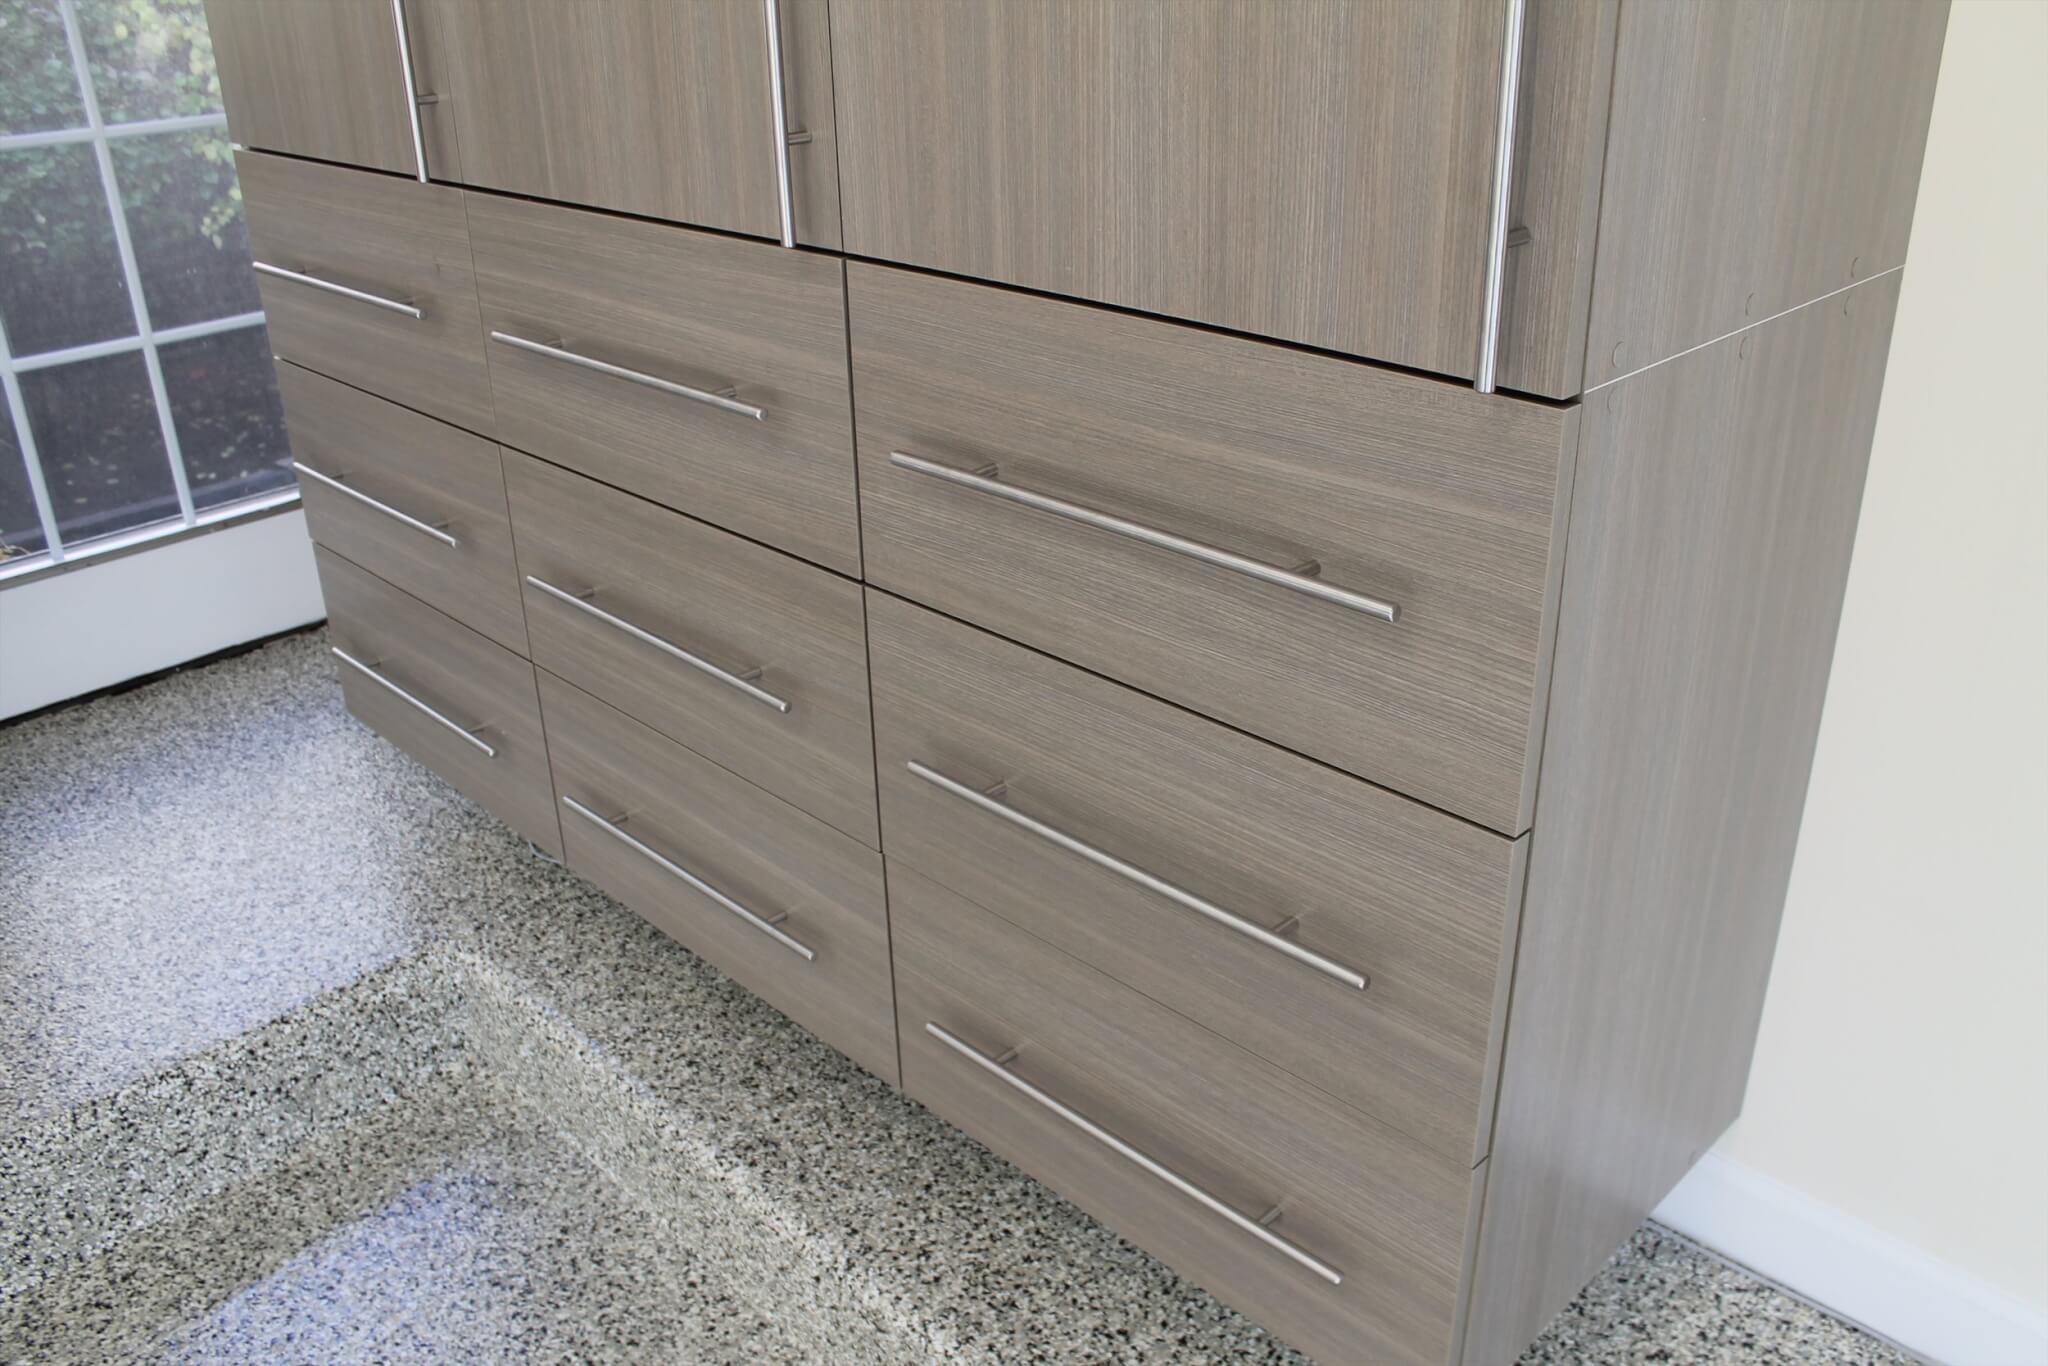 Driftwood+drawers